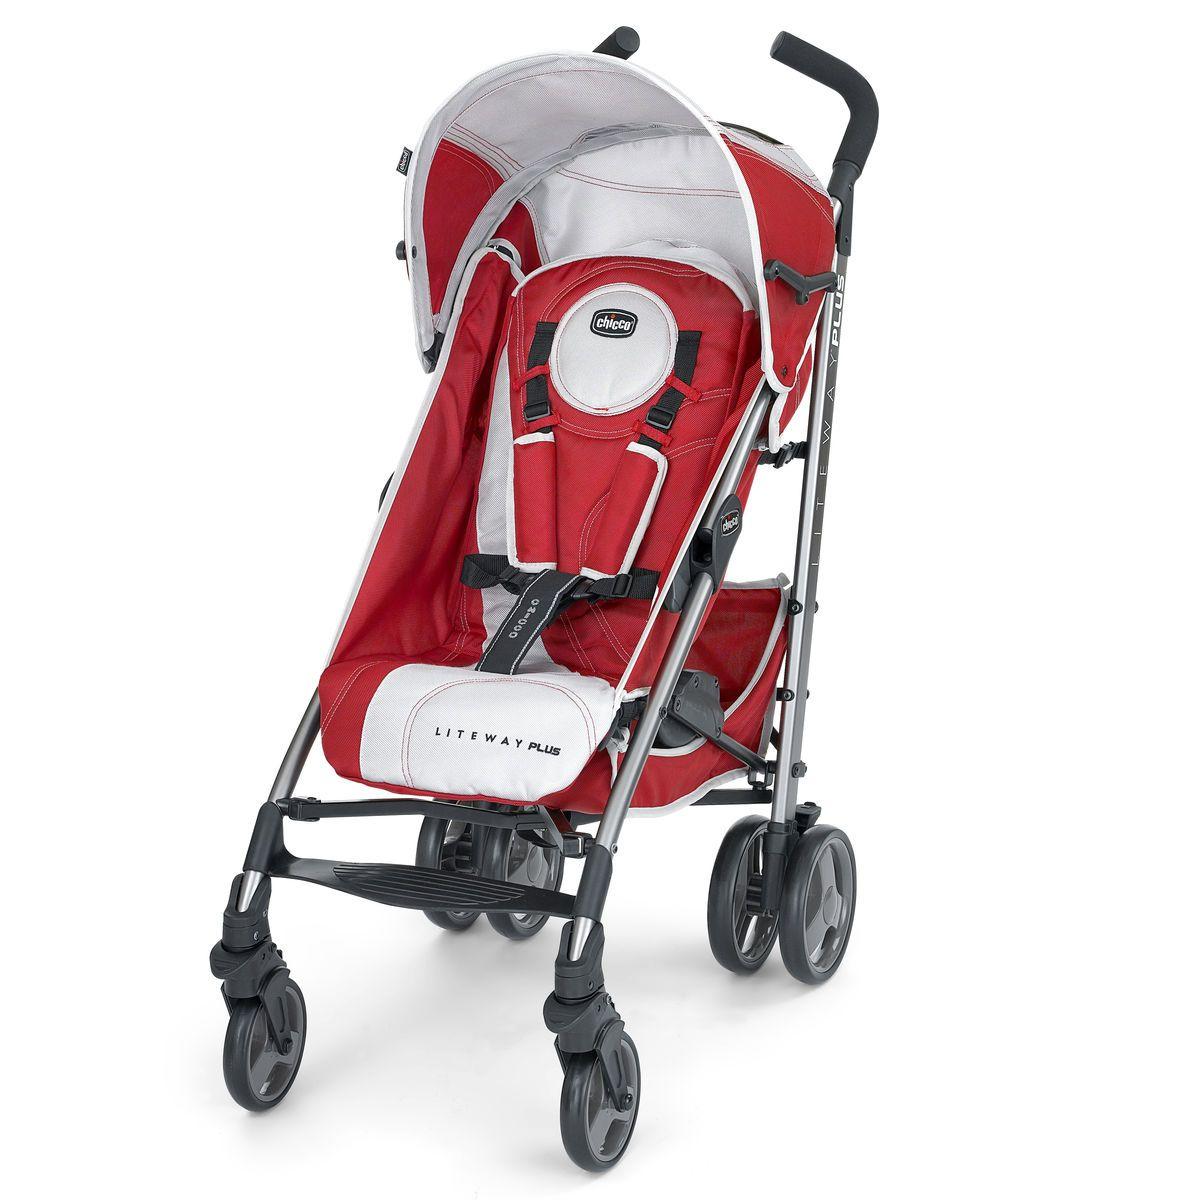 Liteway Plus 2in1 Stroller Snapdragon Car seat